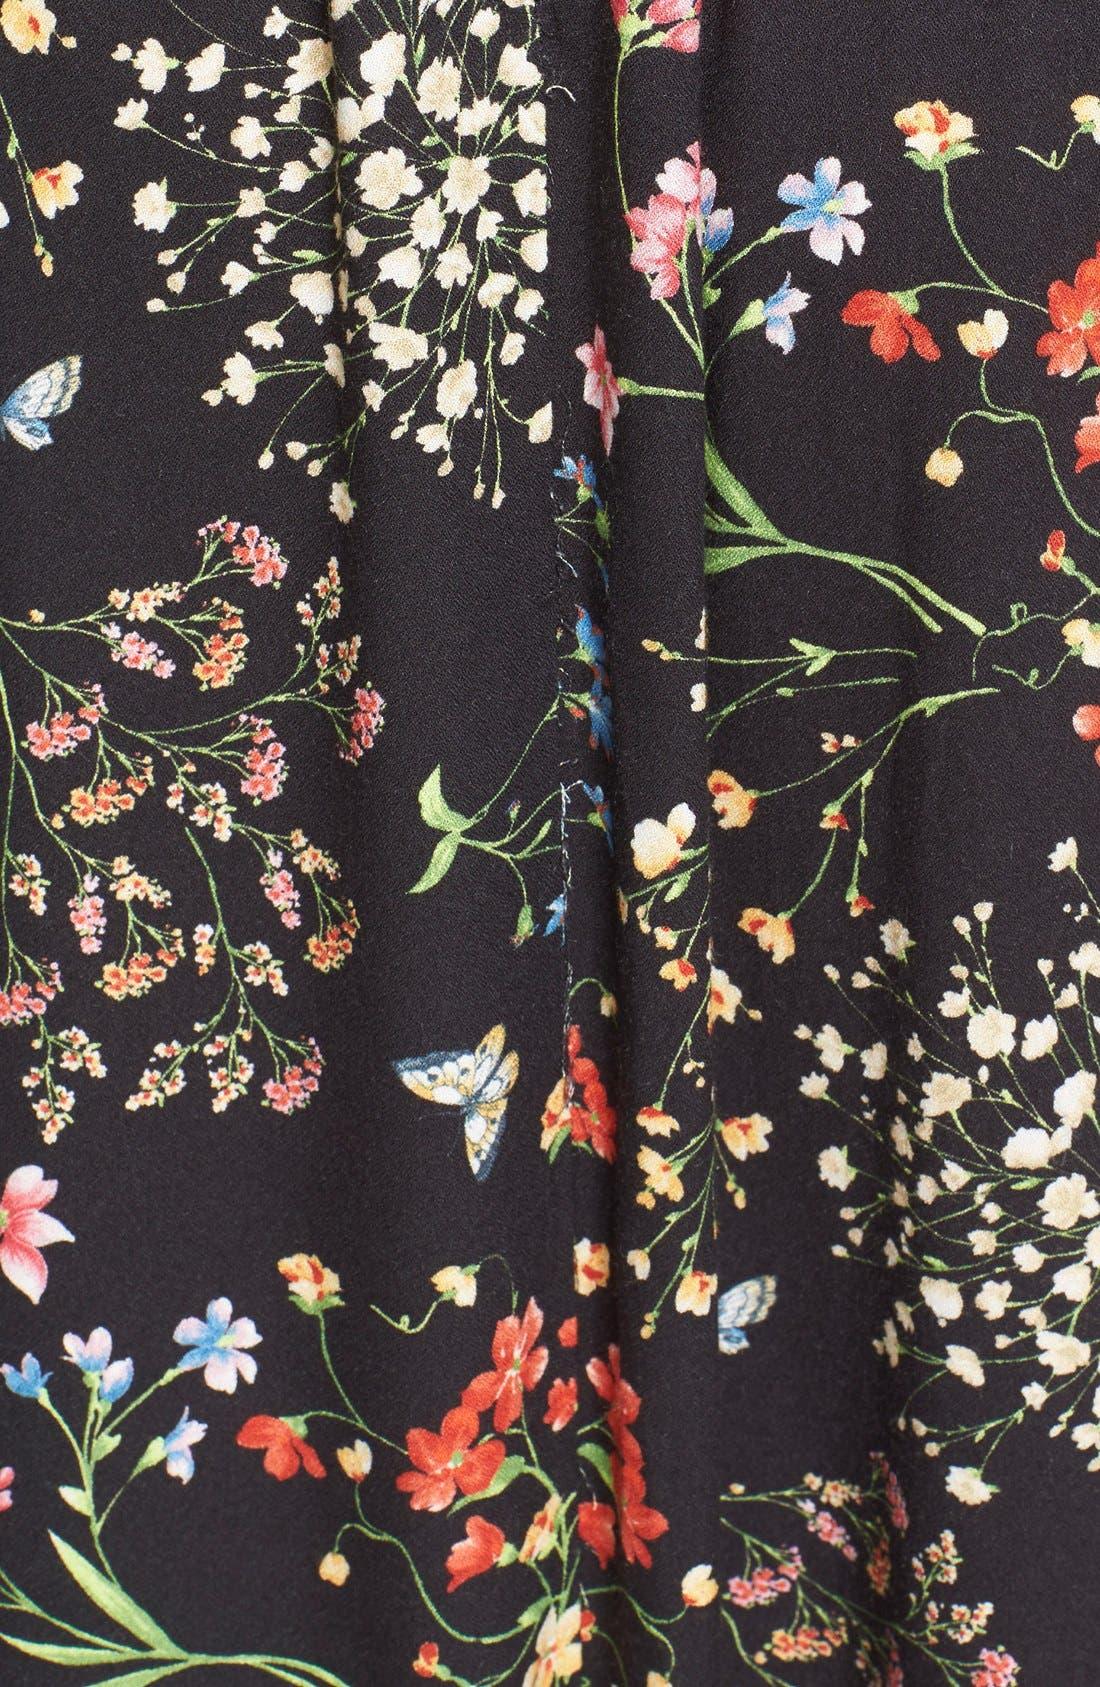 'Cheri' Floral Print Off the Shoulder Maxi Dress,                             Alternate thumbnail 5, color,                             002